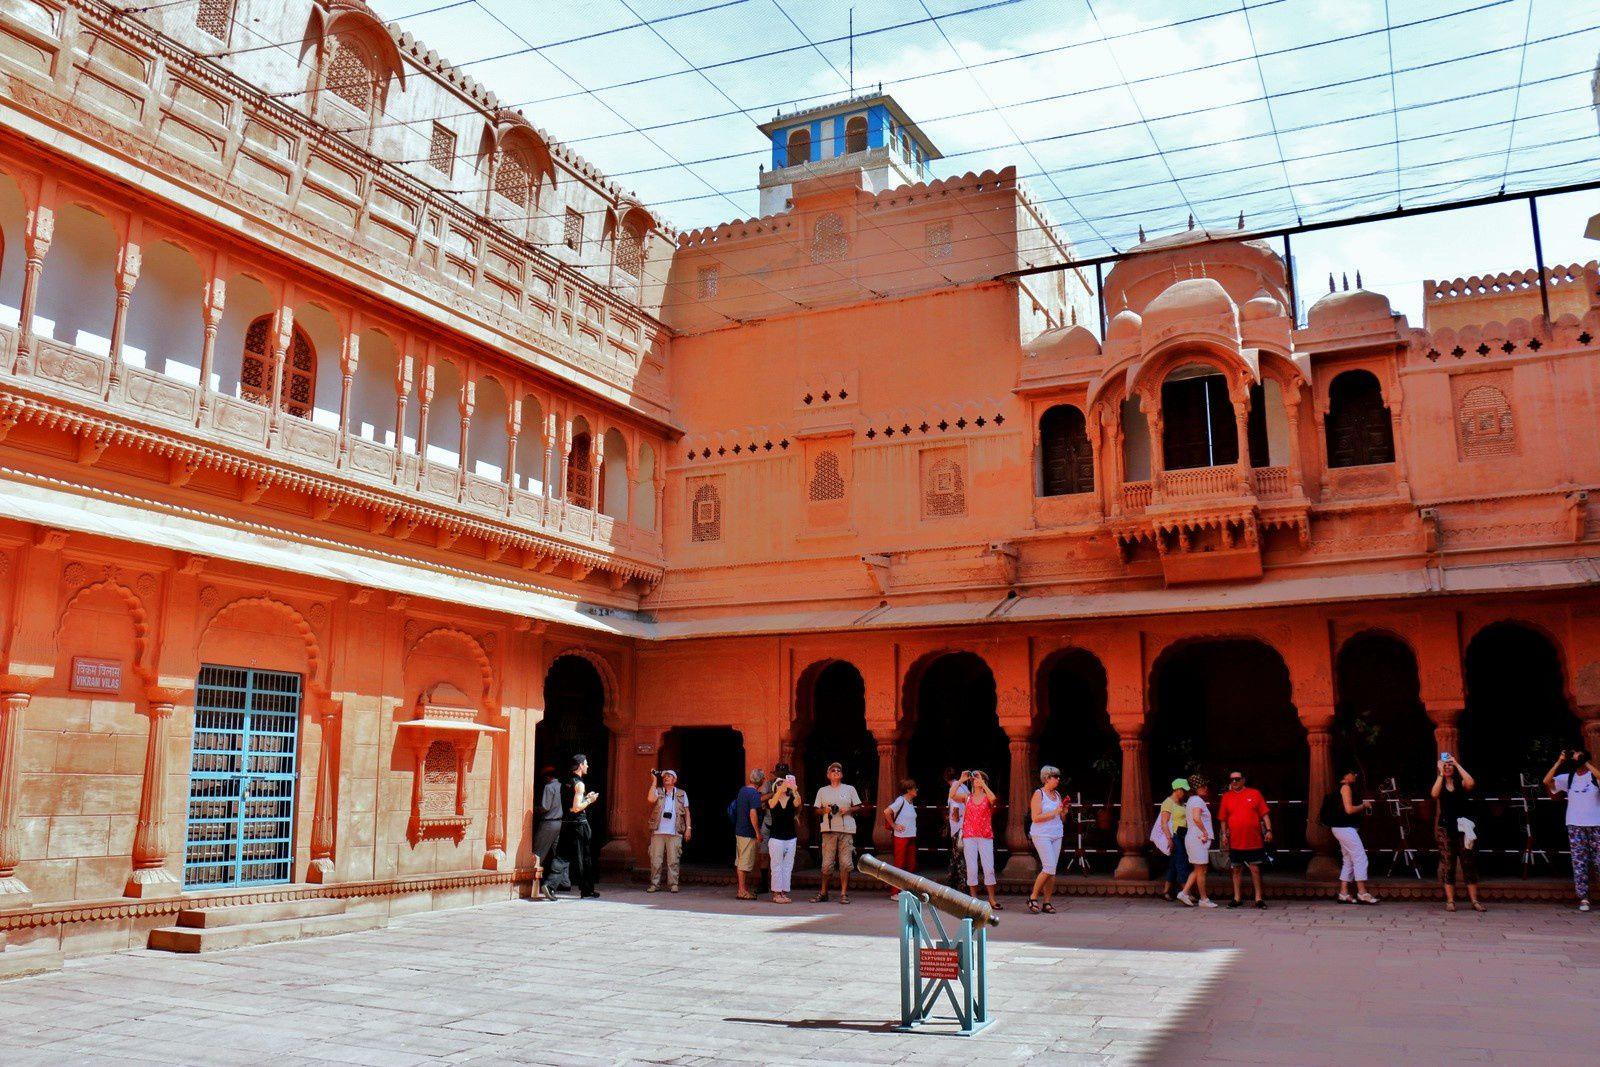 Junagarh Fort (Bikaner, Inde), première cour du palais de mahârâja.